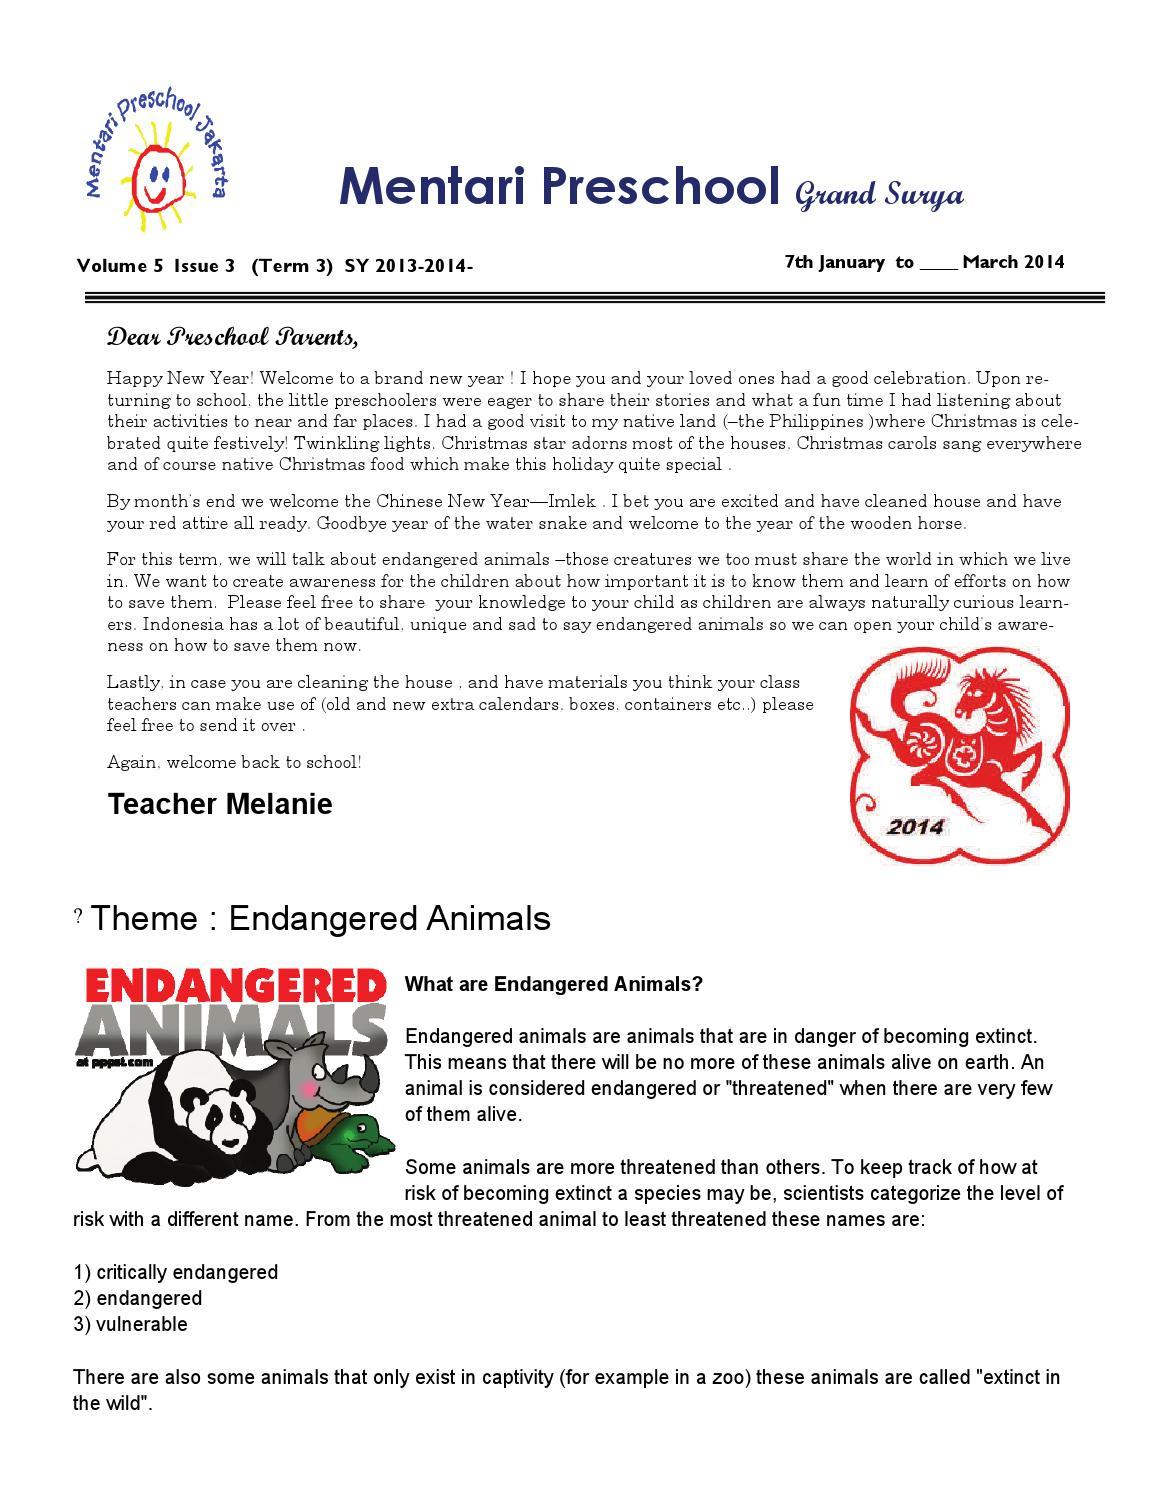 2013 2014 preschool newsletter term3 by Mentari Grand